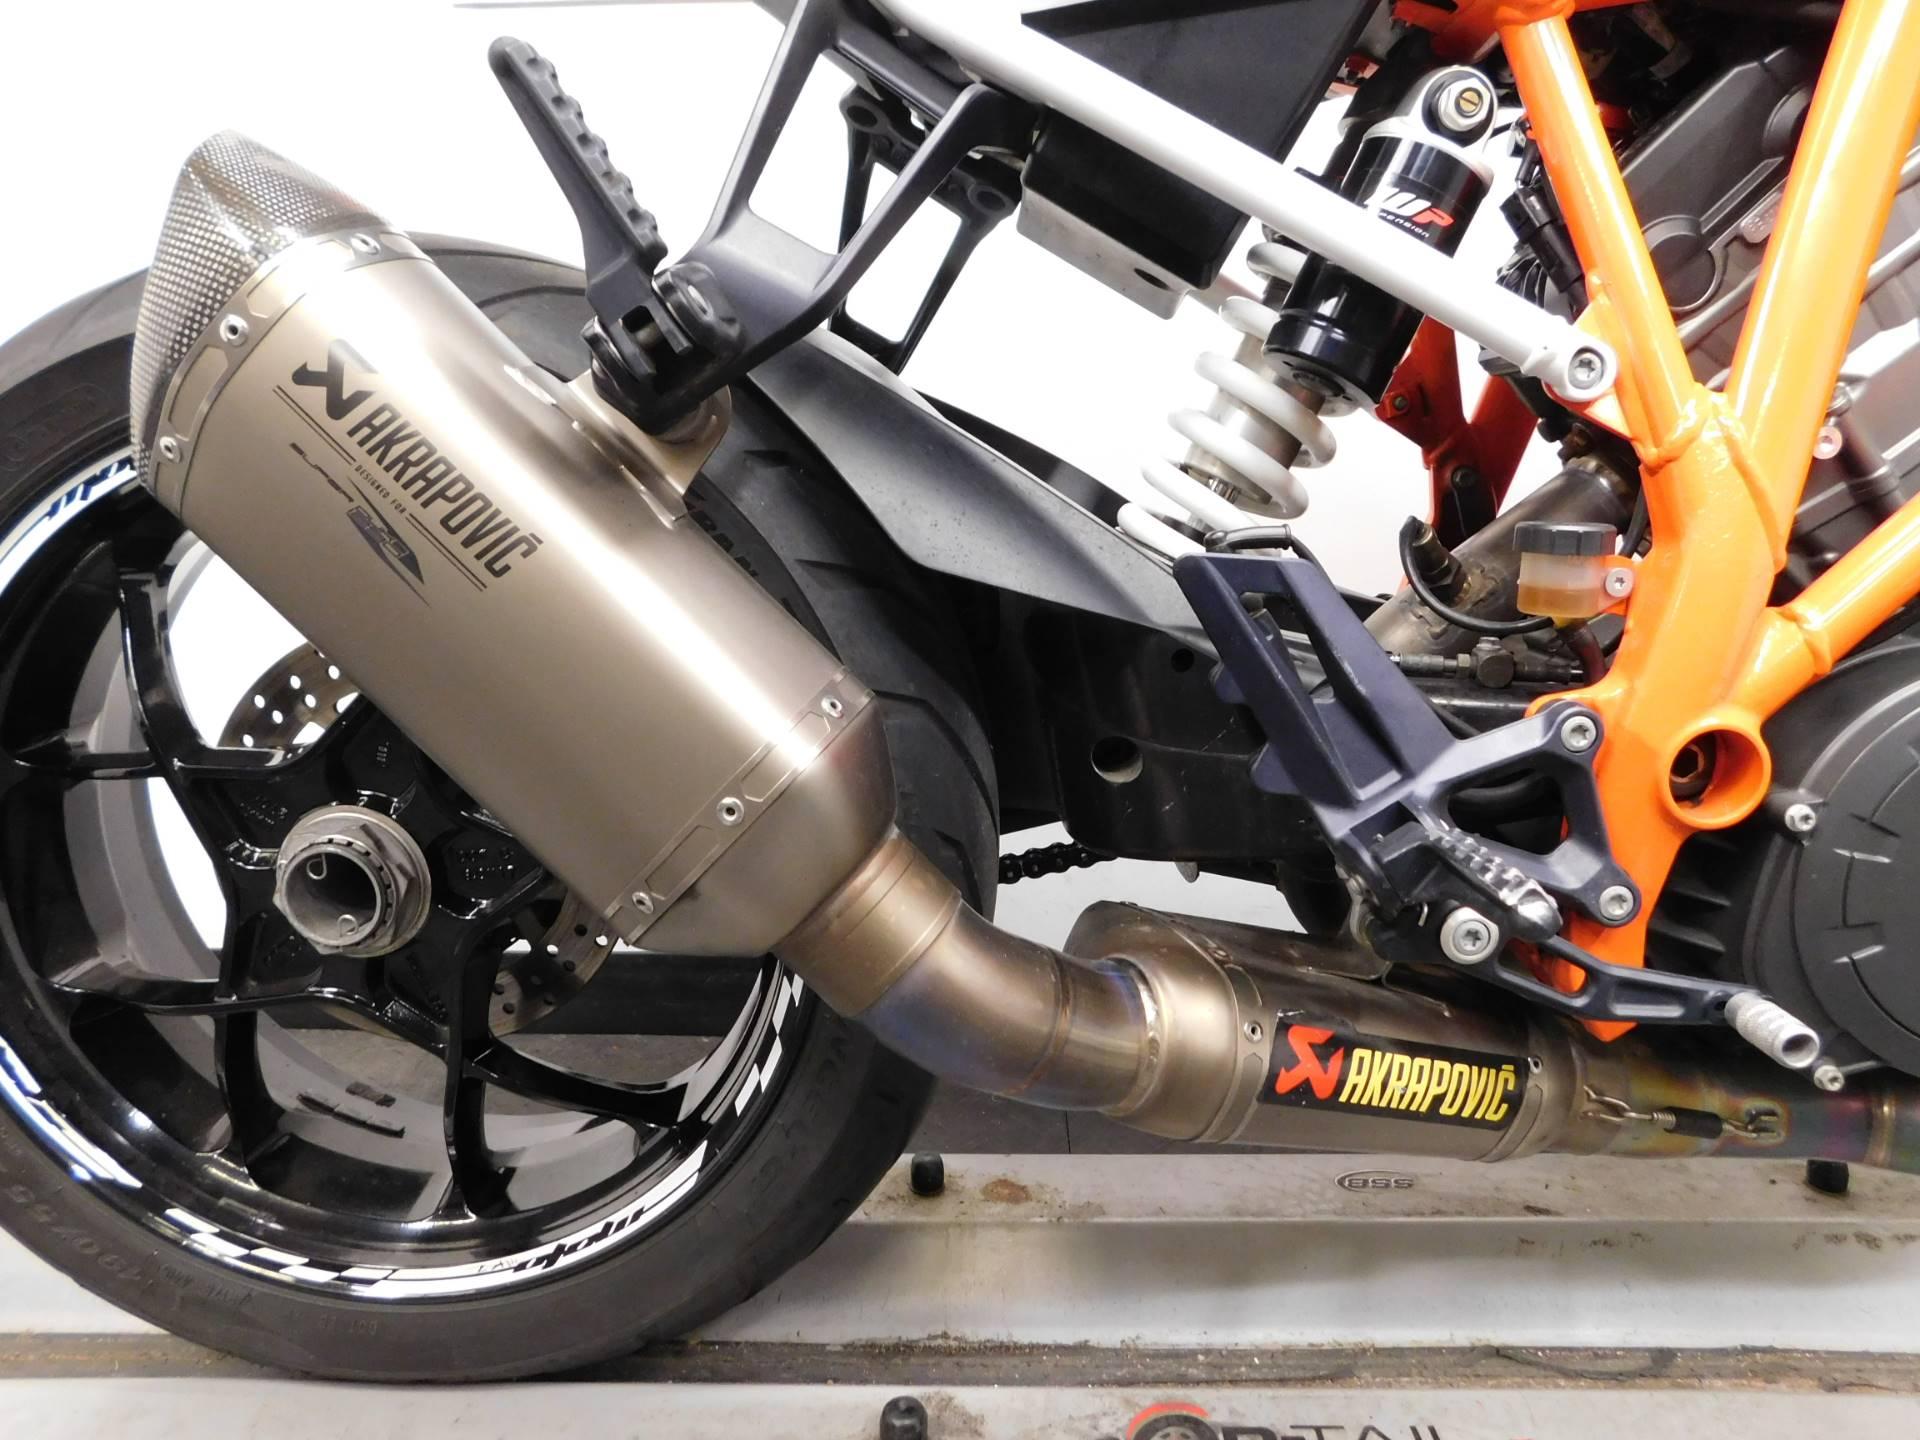 2015 KTM 1290 Super Duke R 11